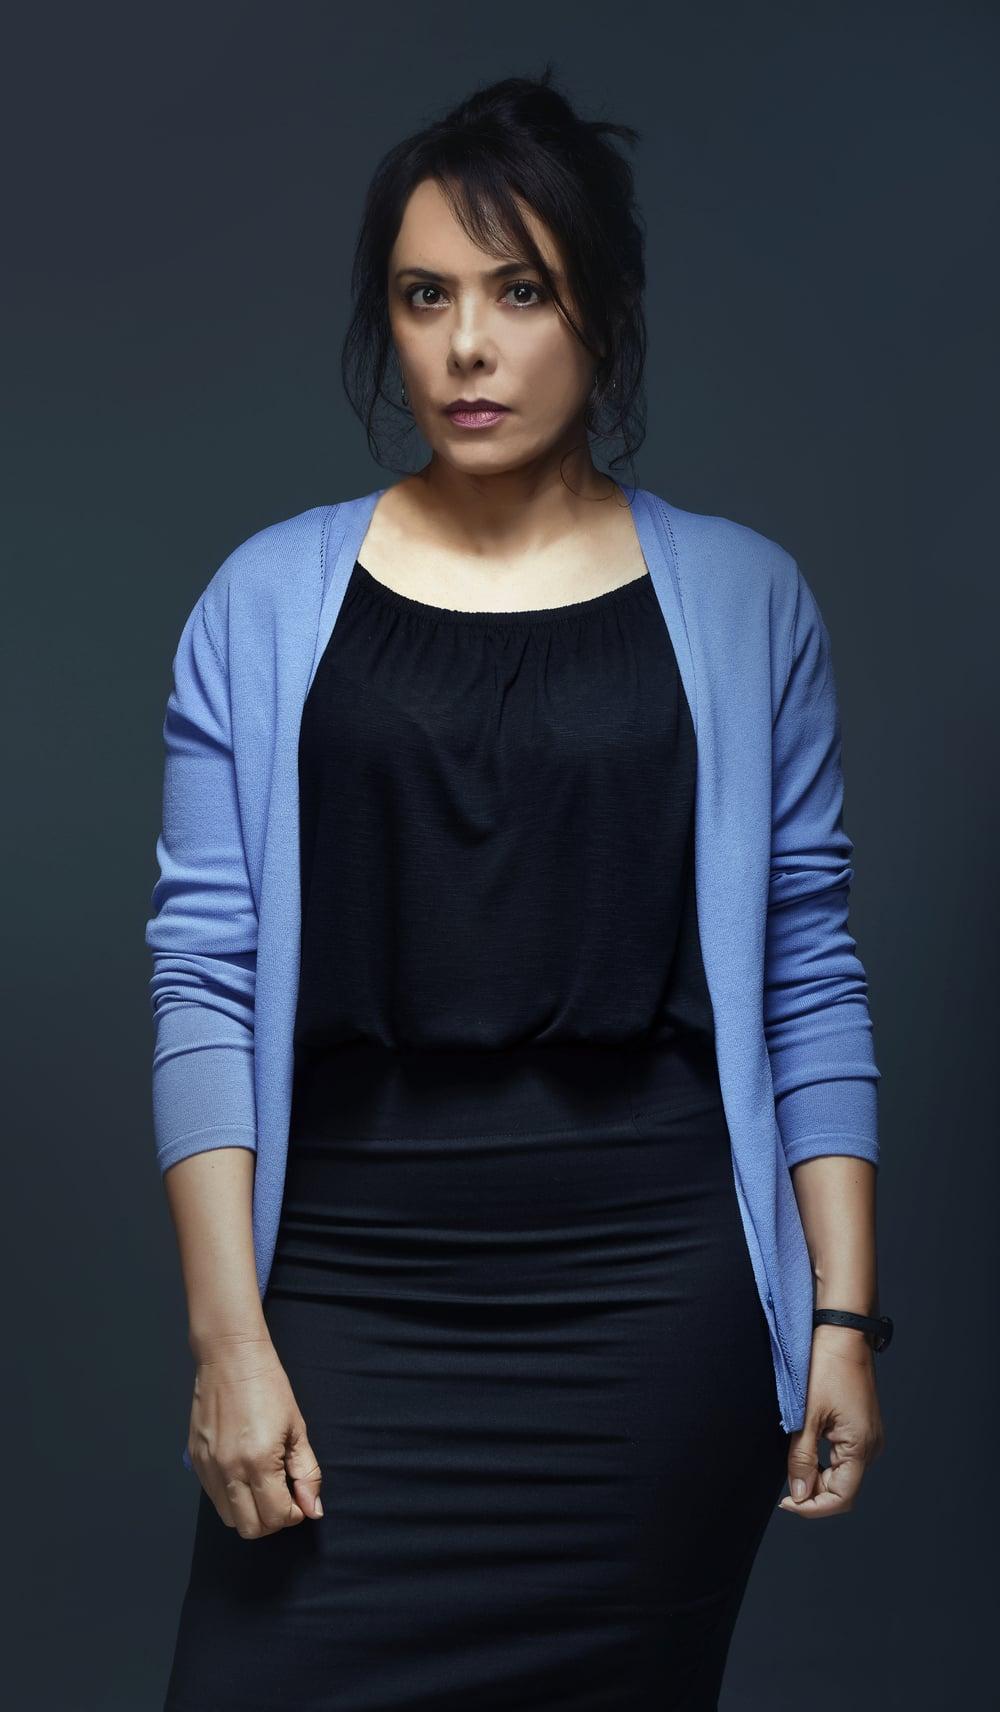 LQDC_Carmen Madrid como Mariela Acosta_001.jpg